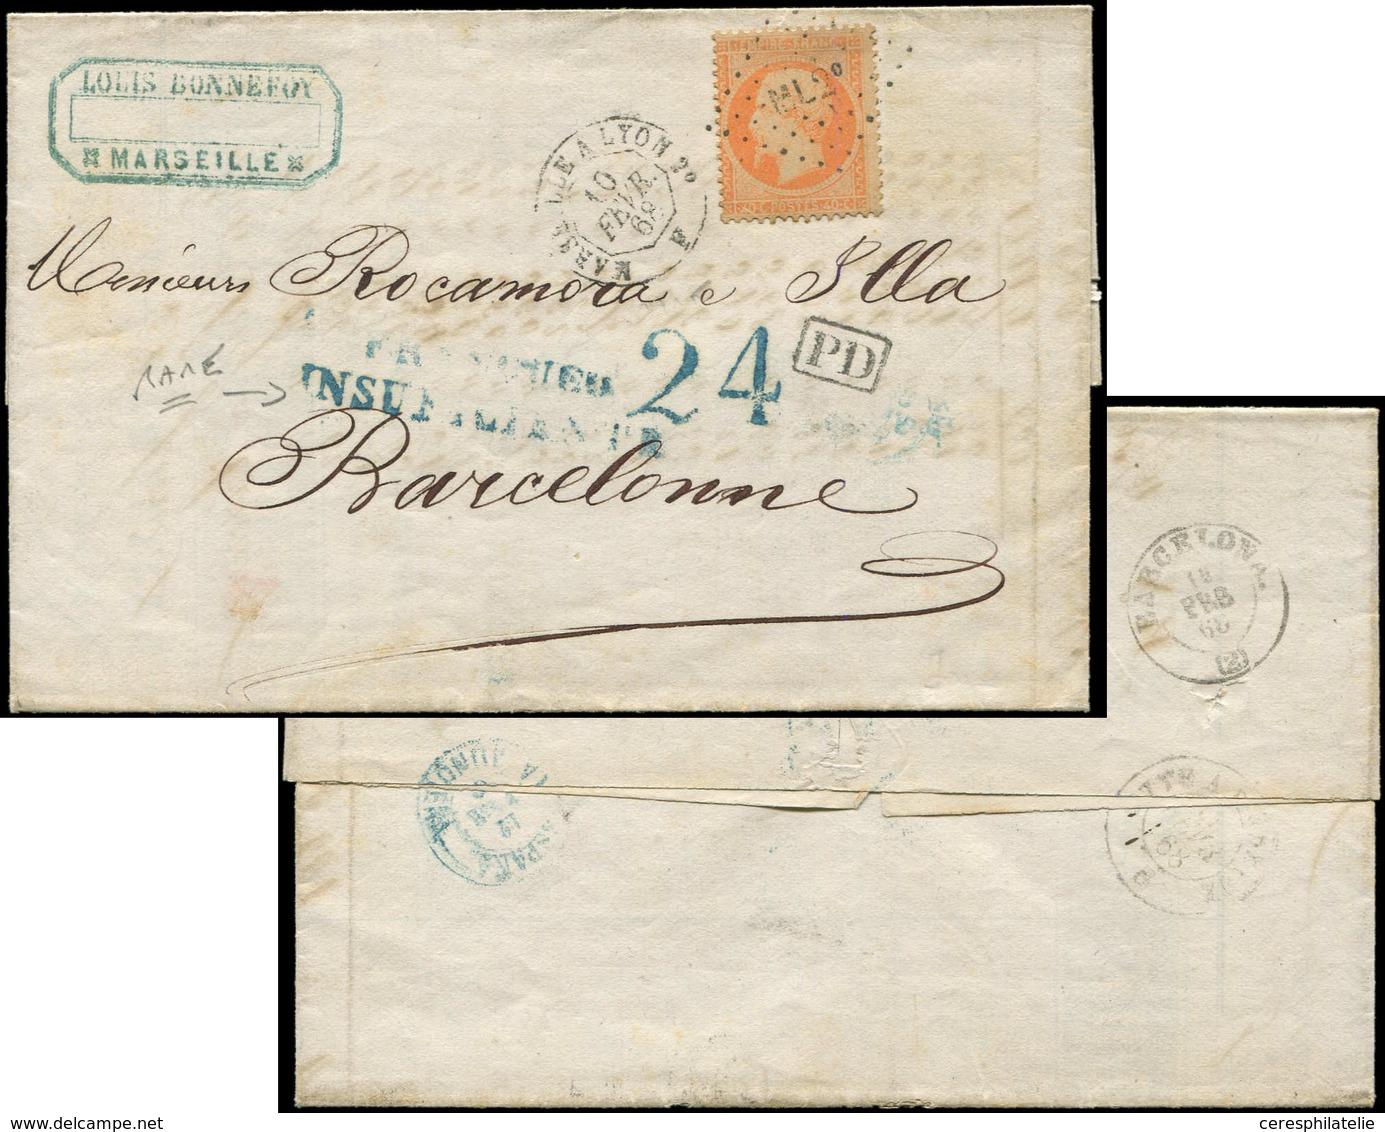 Let EMPIRE DENTELE - 23   40c. Orange, Obl. Amb. ML2e S. LAC, Càd MARSEILLE A LYON 2e 10/2/68, RR Griffe FRANQUEO INSUFI - 1862 Napoleon III